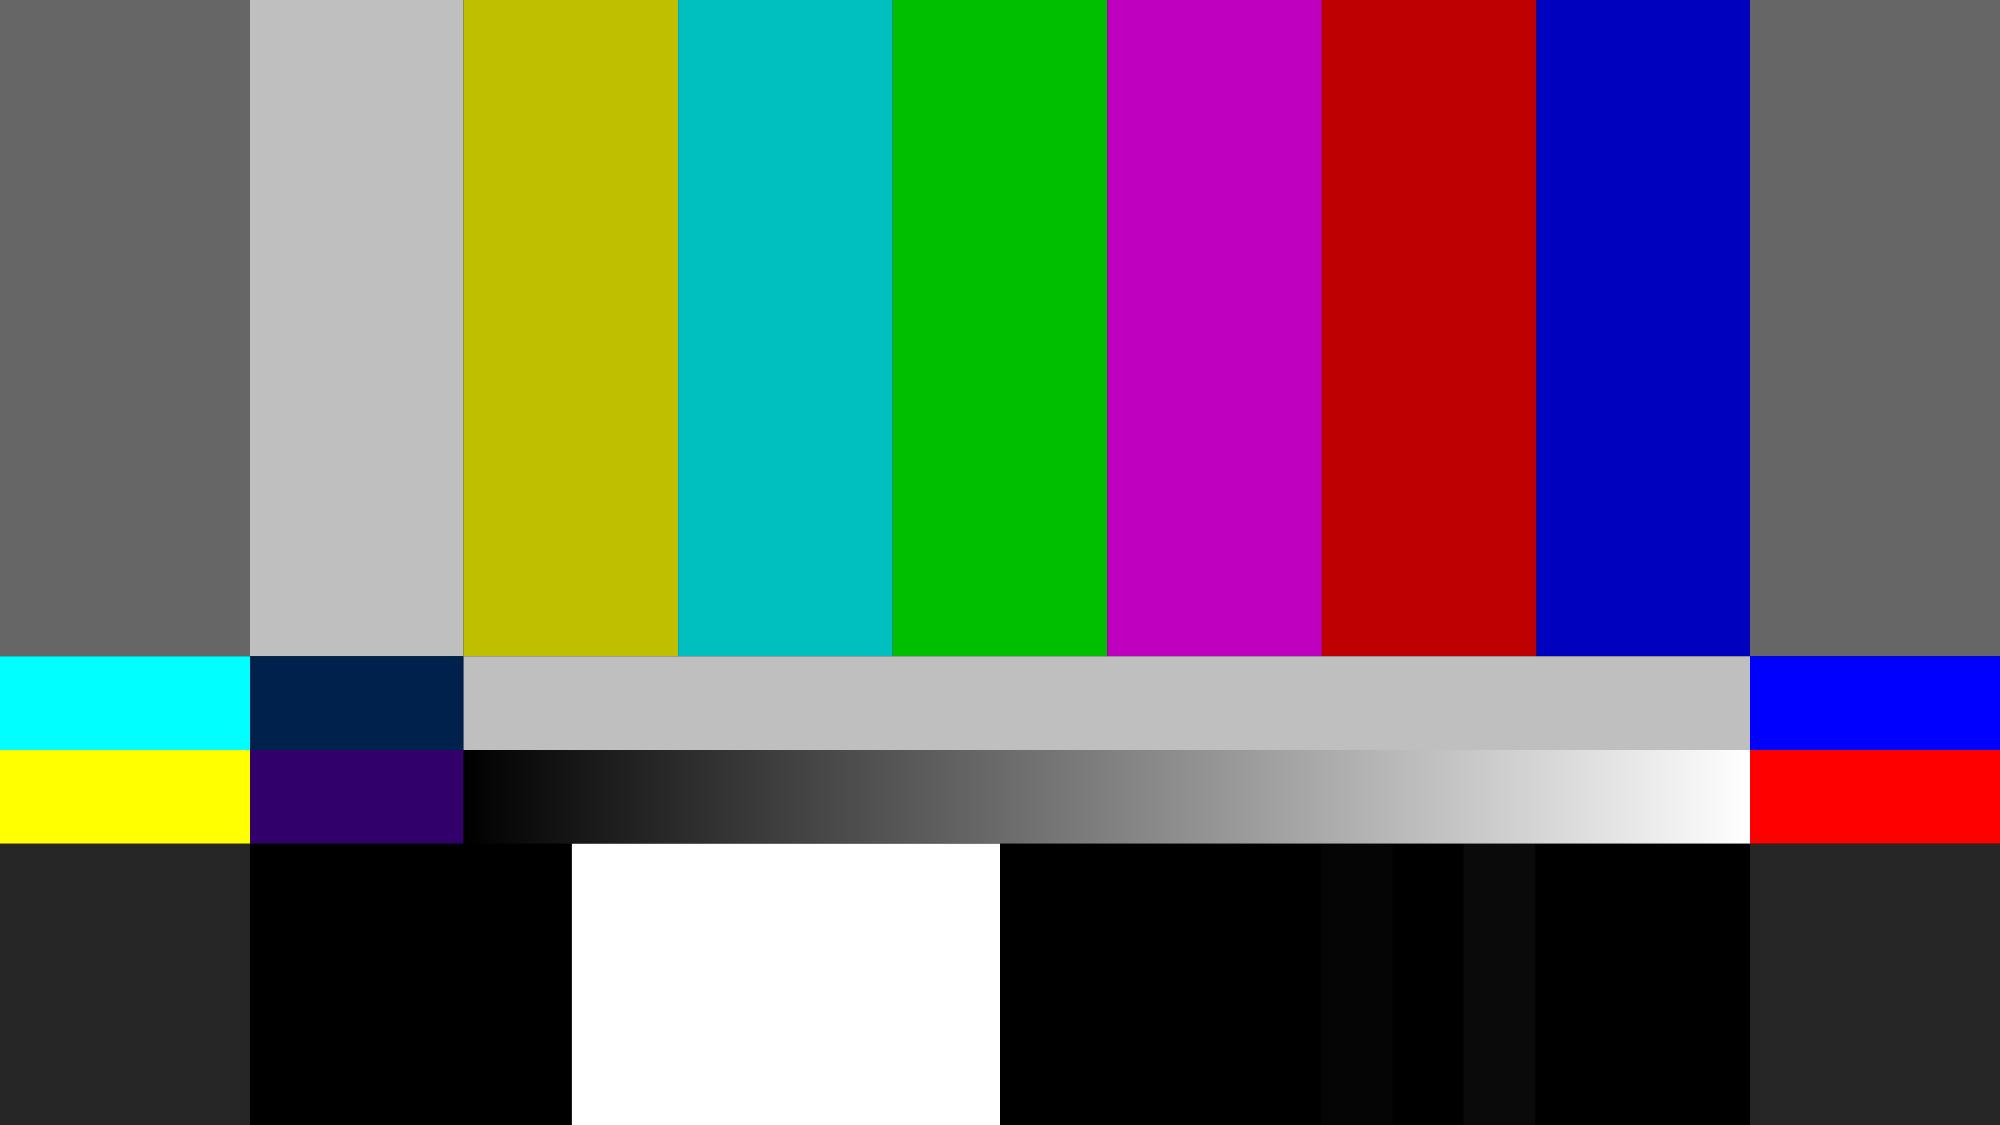 Samsung internet TV Logo | Logos Rates